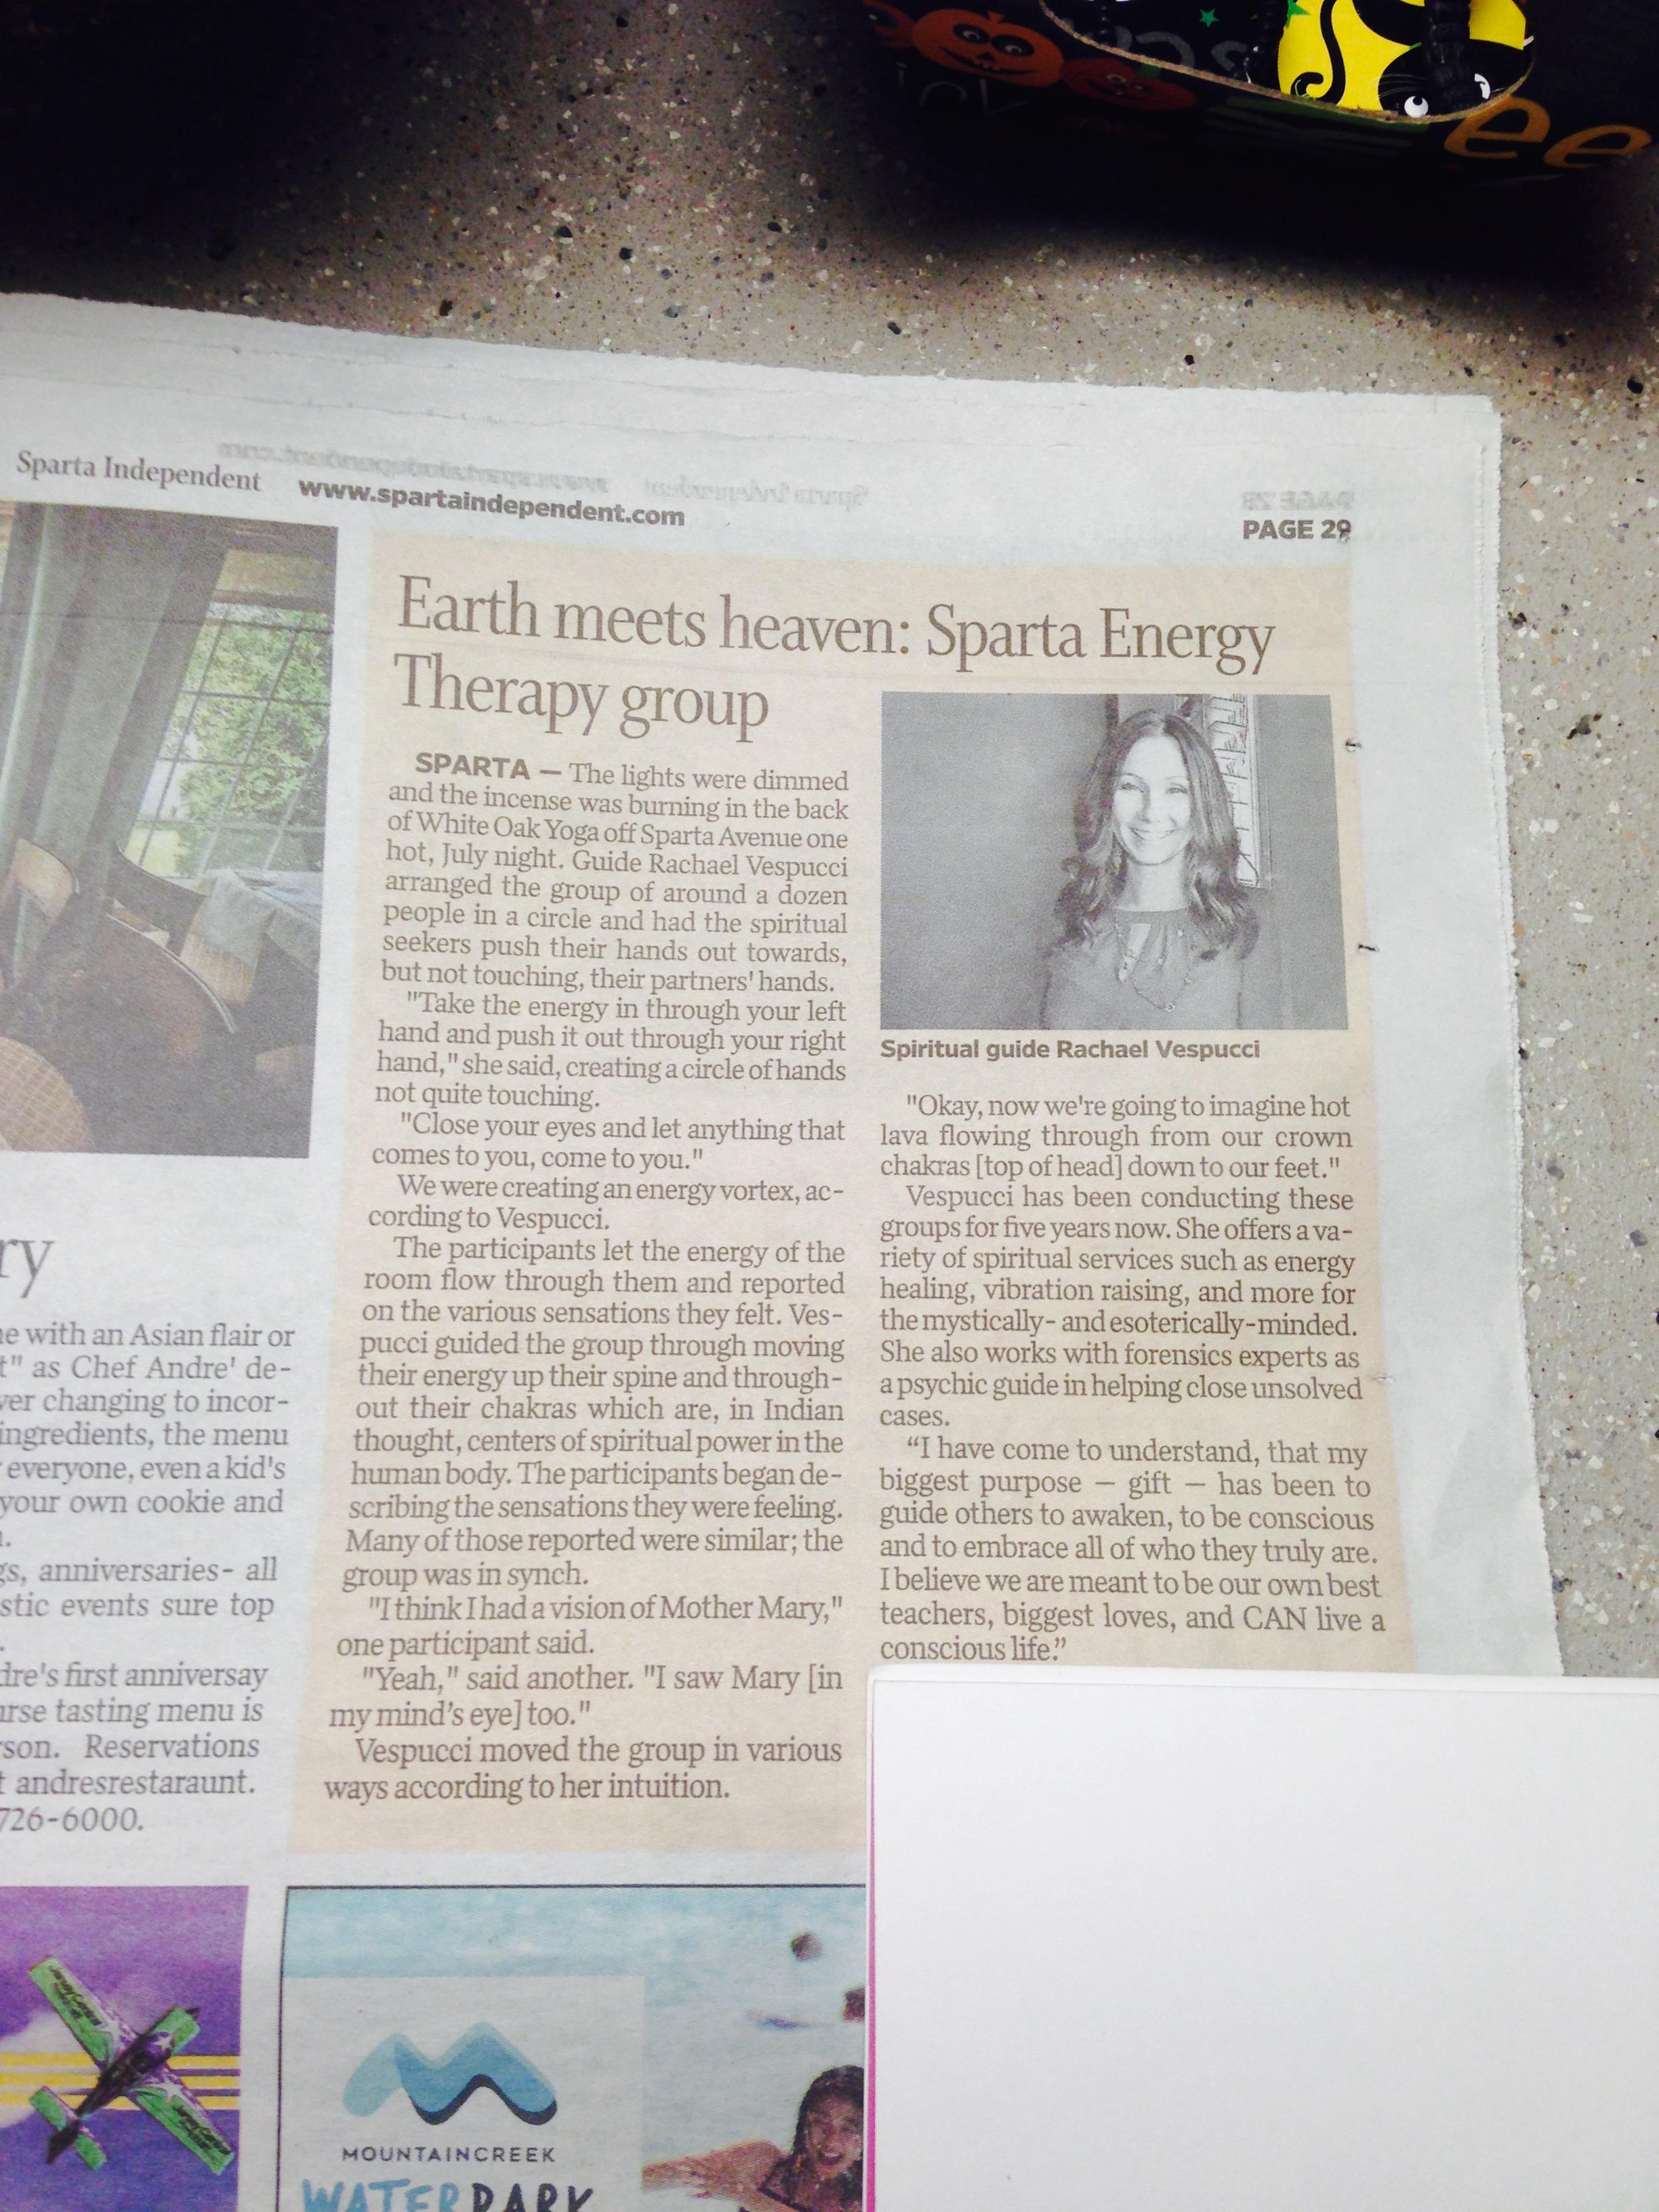 Sparta-independent-news.jpg